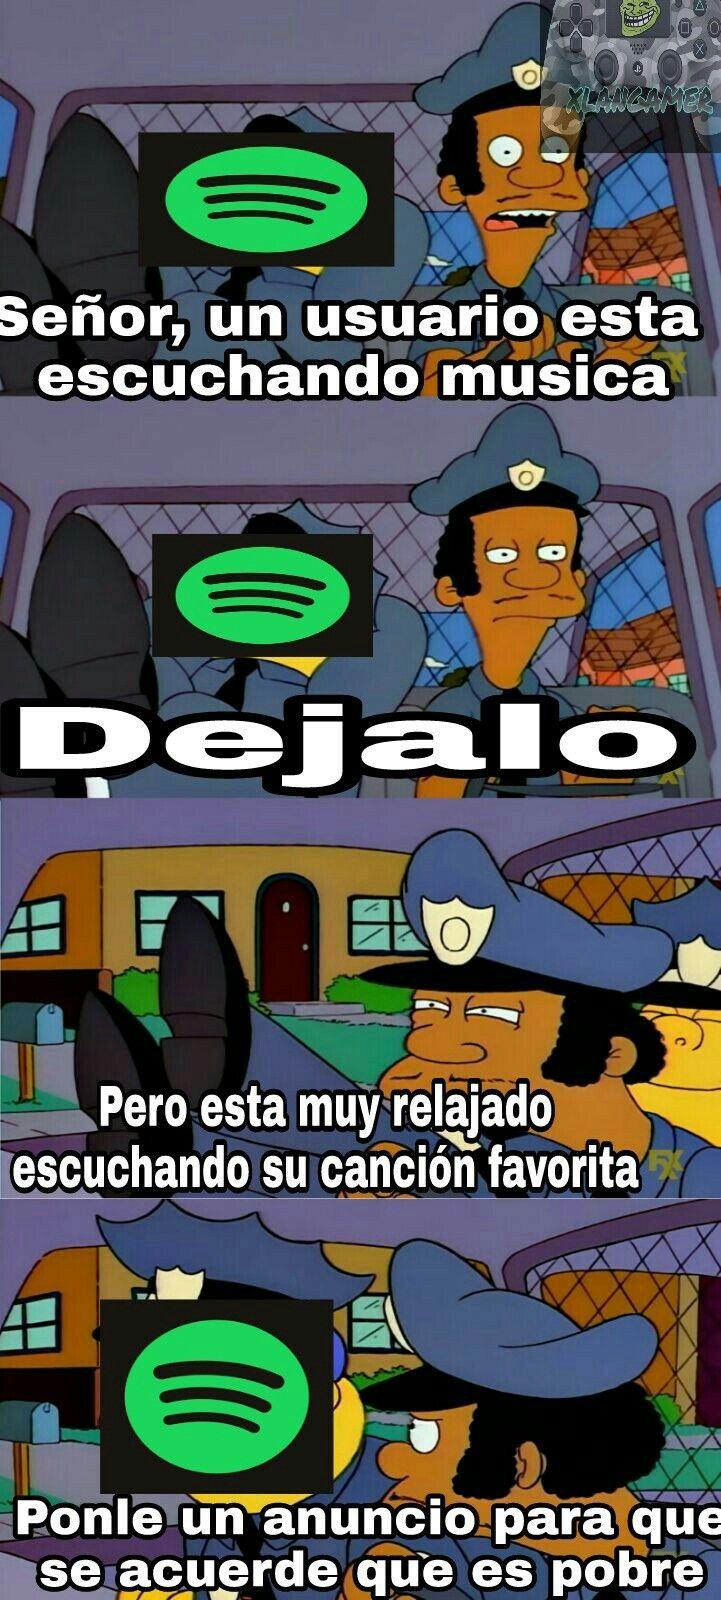 Spotify el ke mas rova :v